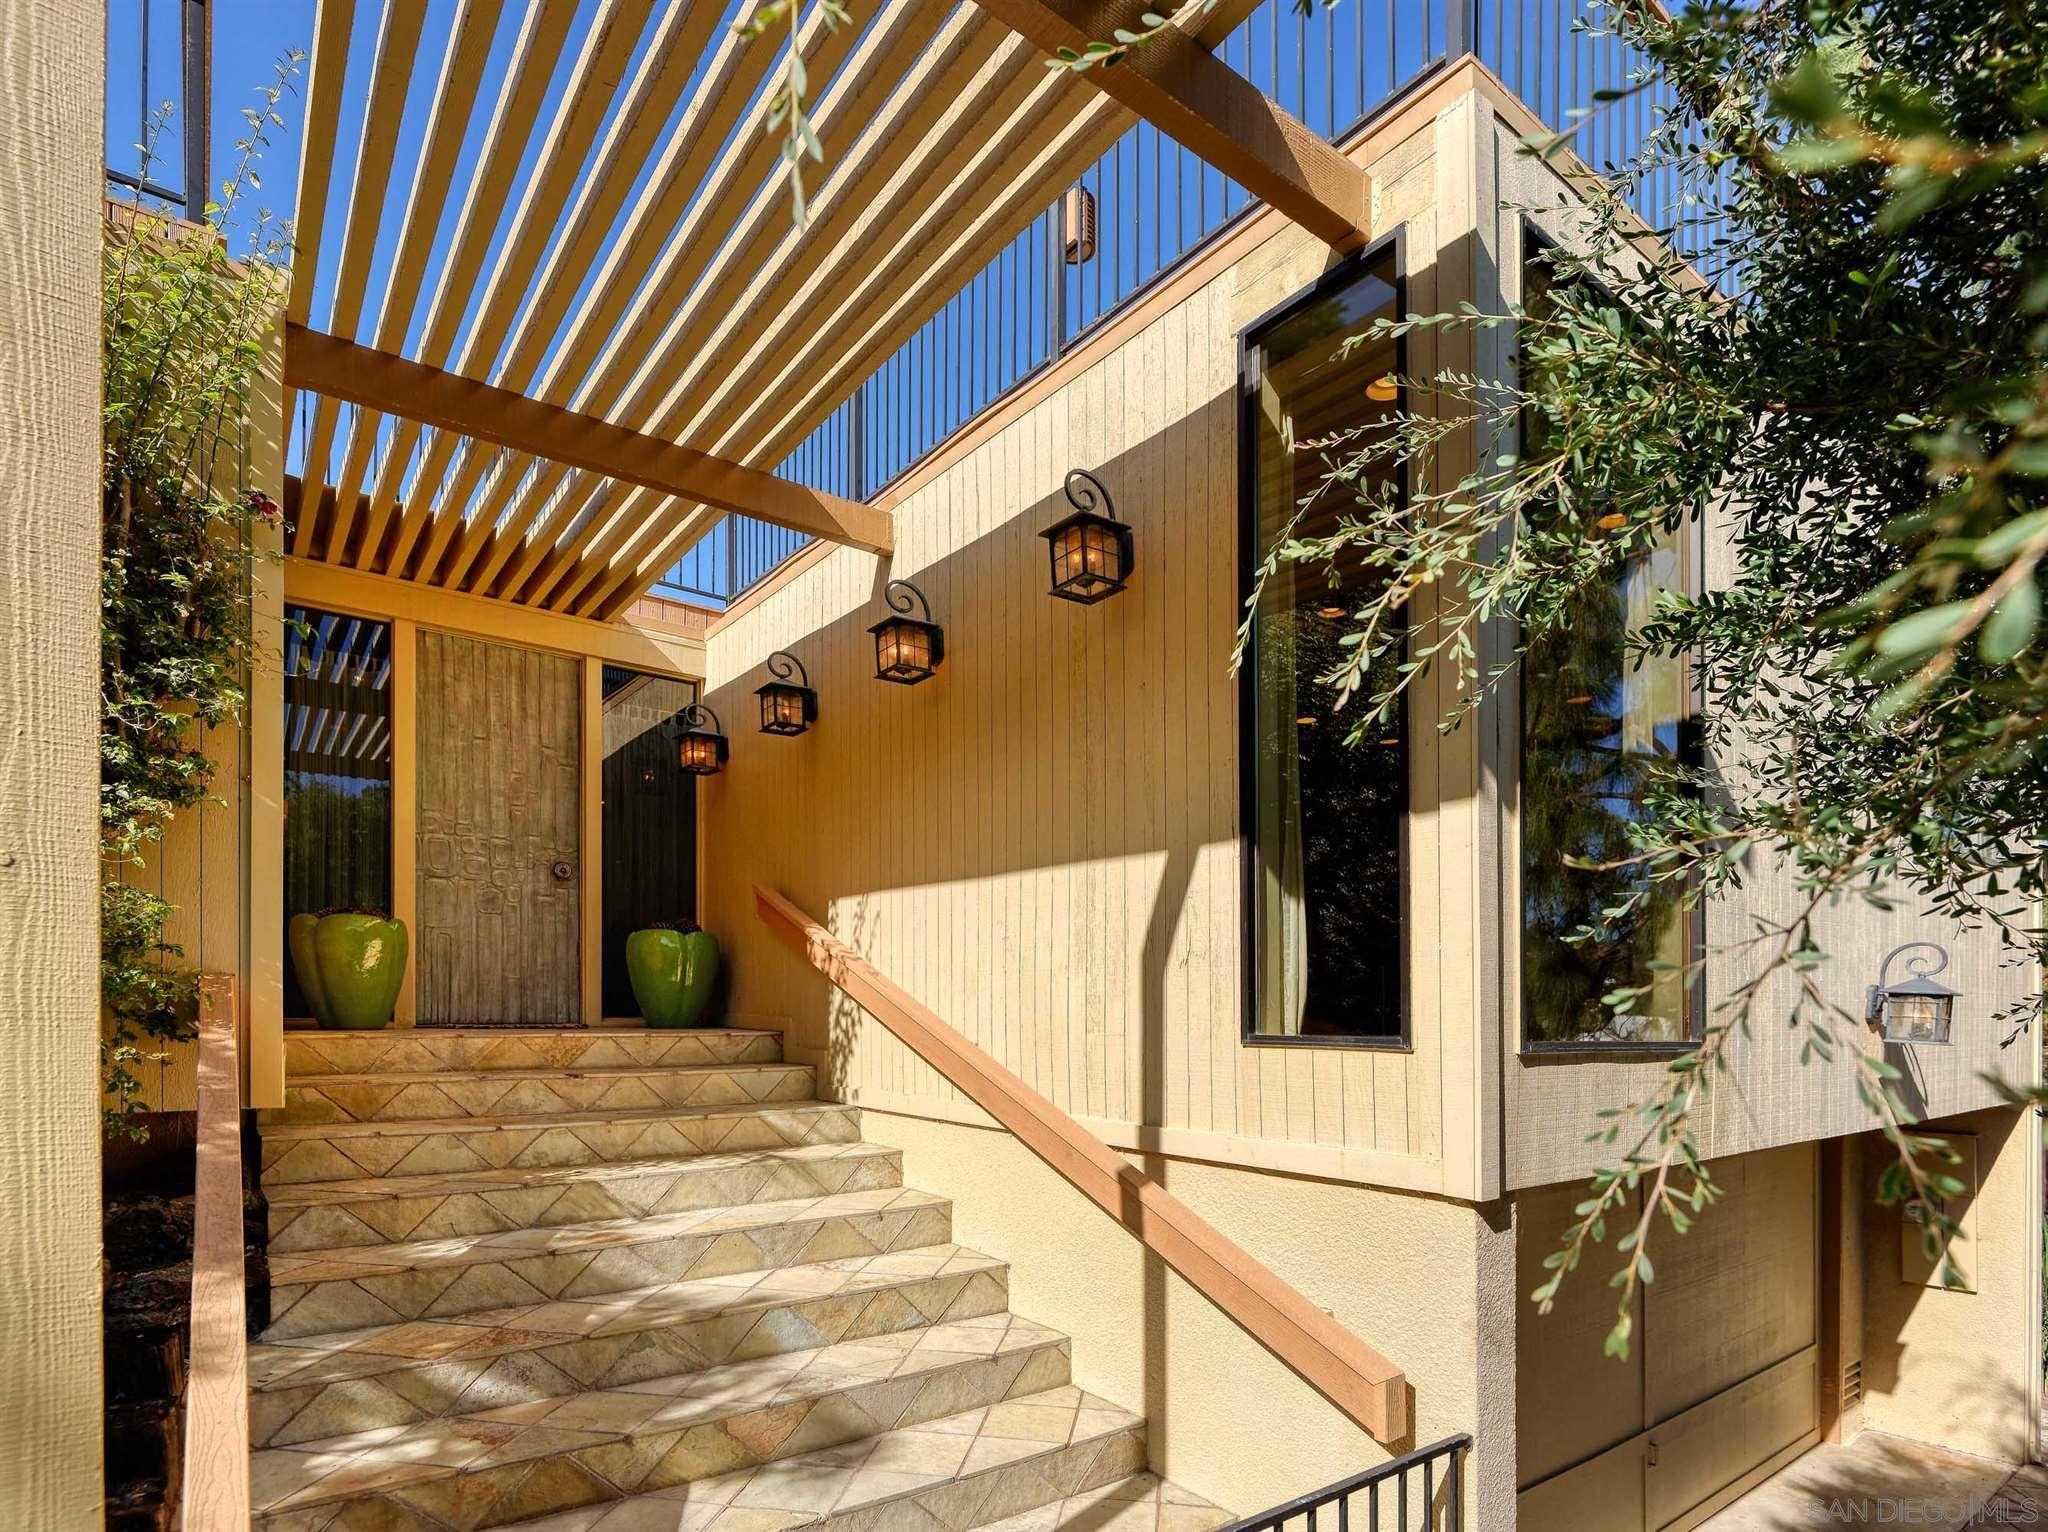 $3,875,000 - 5Br/5Ba -  for Sale in Muirlands, La Jolla